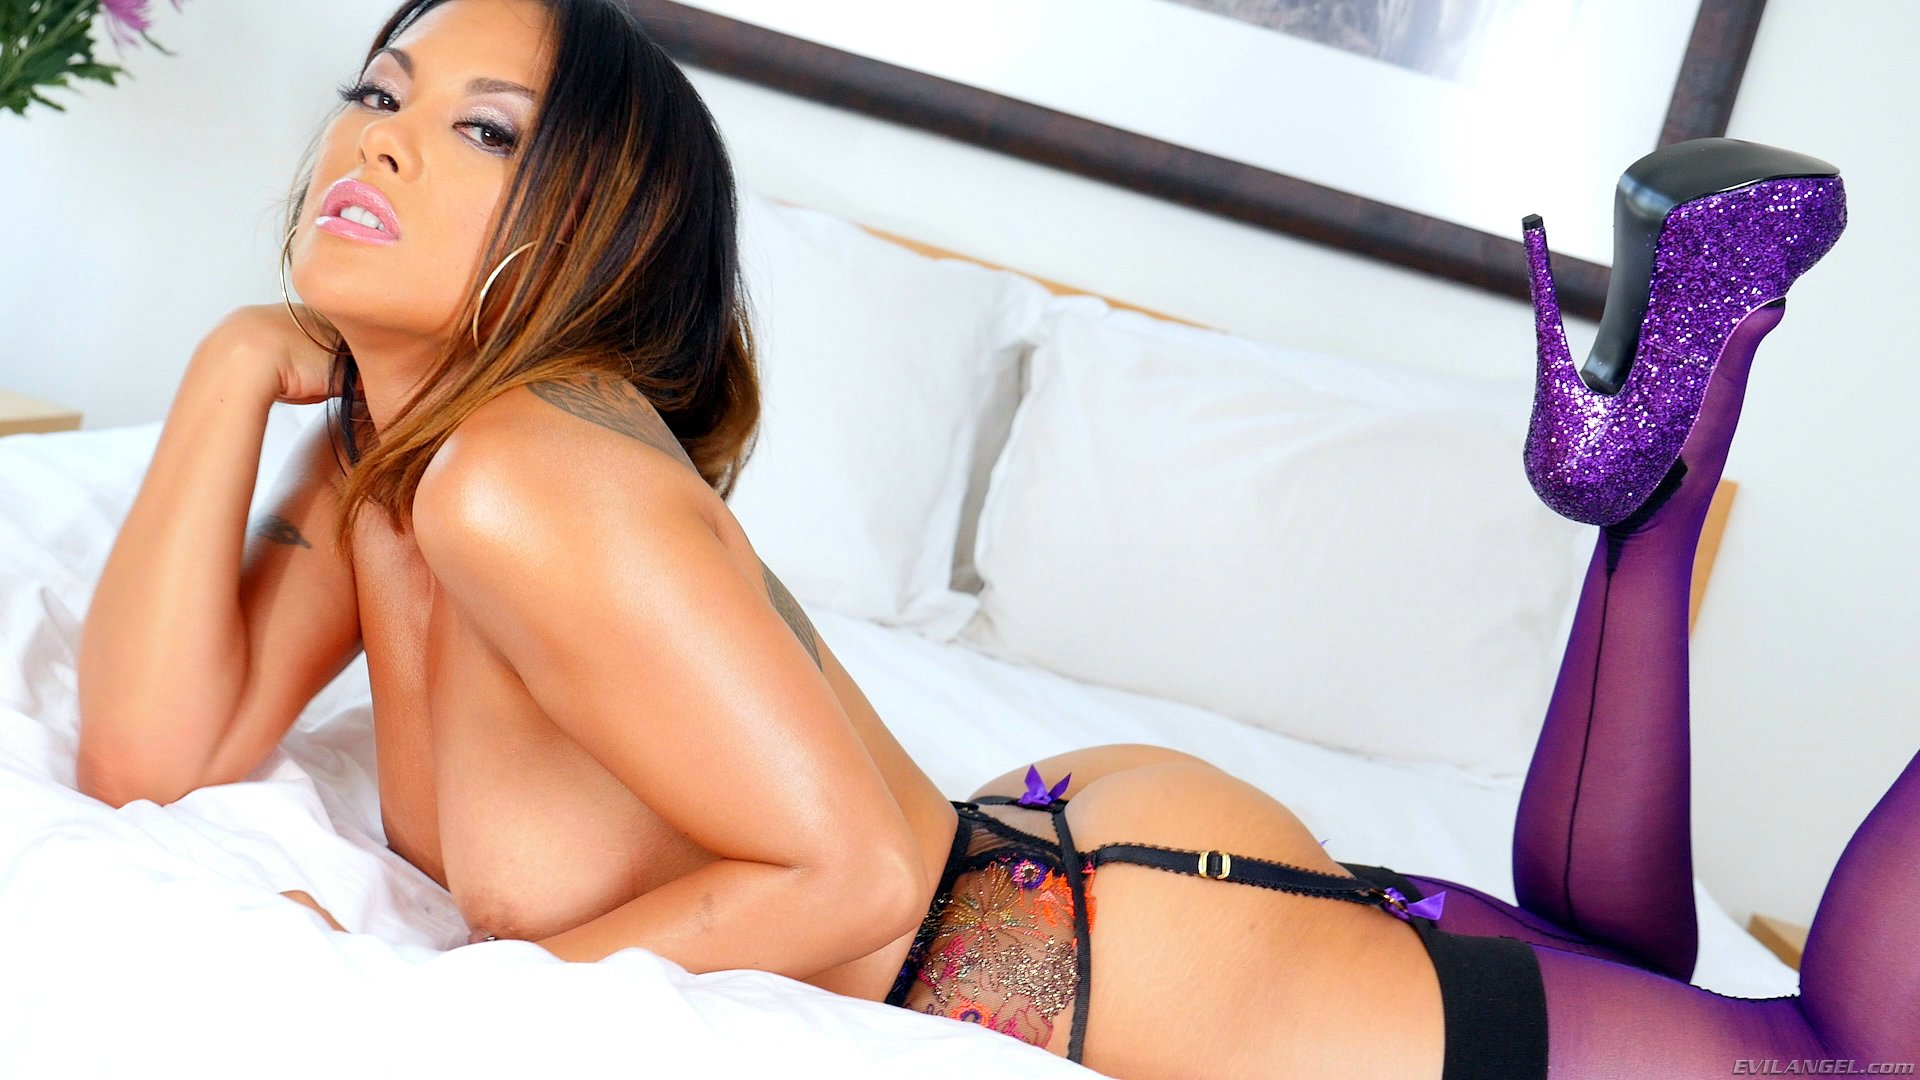 Kaylani Lei In Sexy Underwear Purple Stockings And High